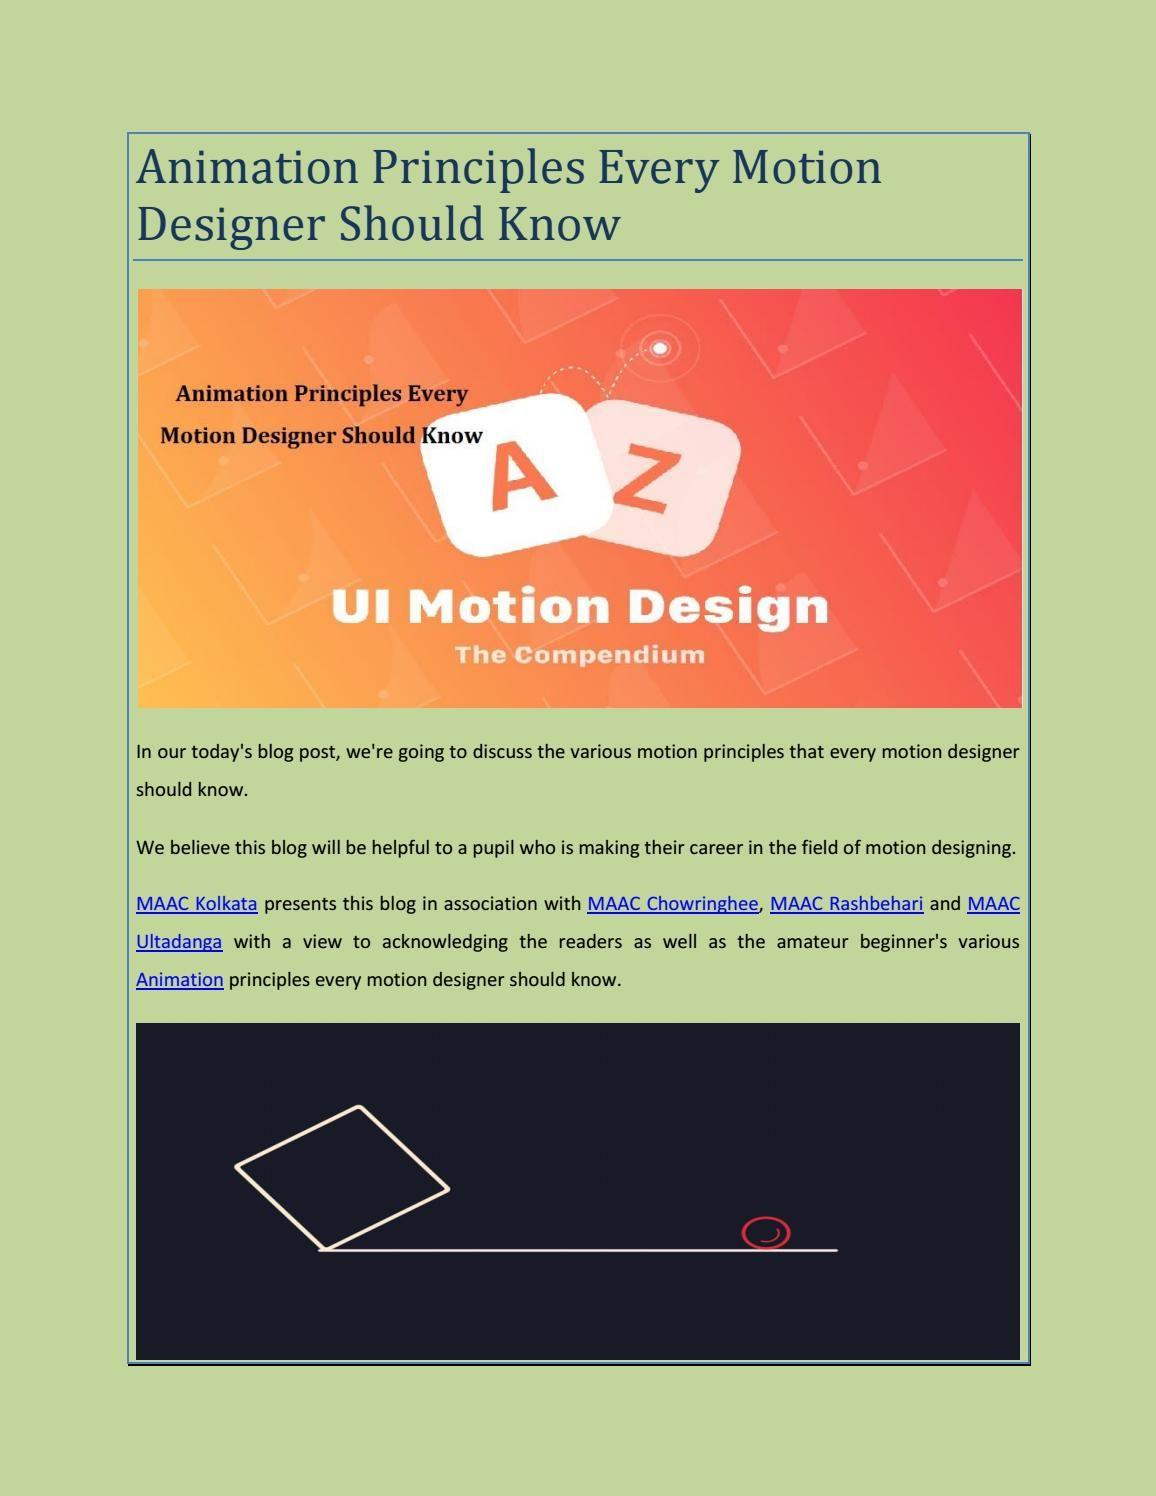 Animation principles every motion designer should know pdf also blog rh pinterest